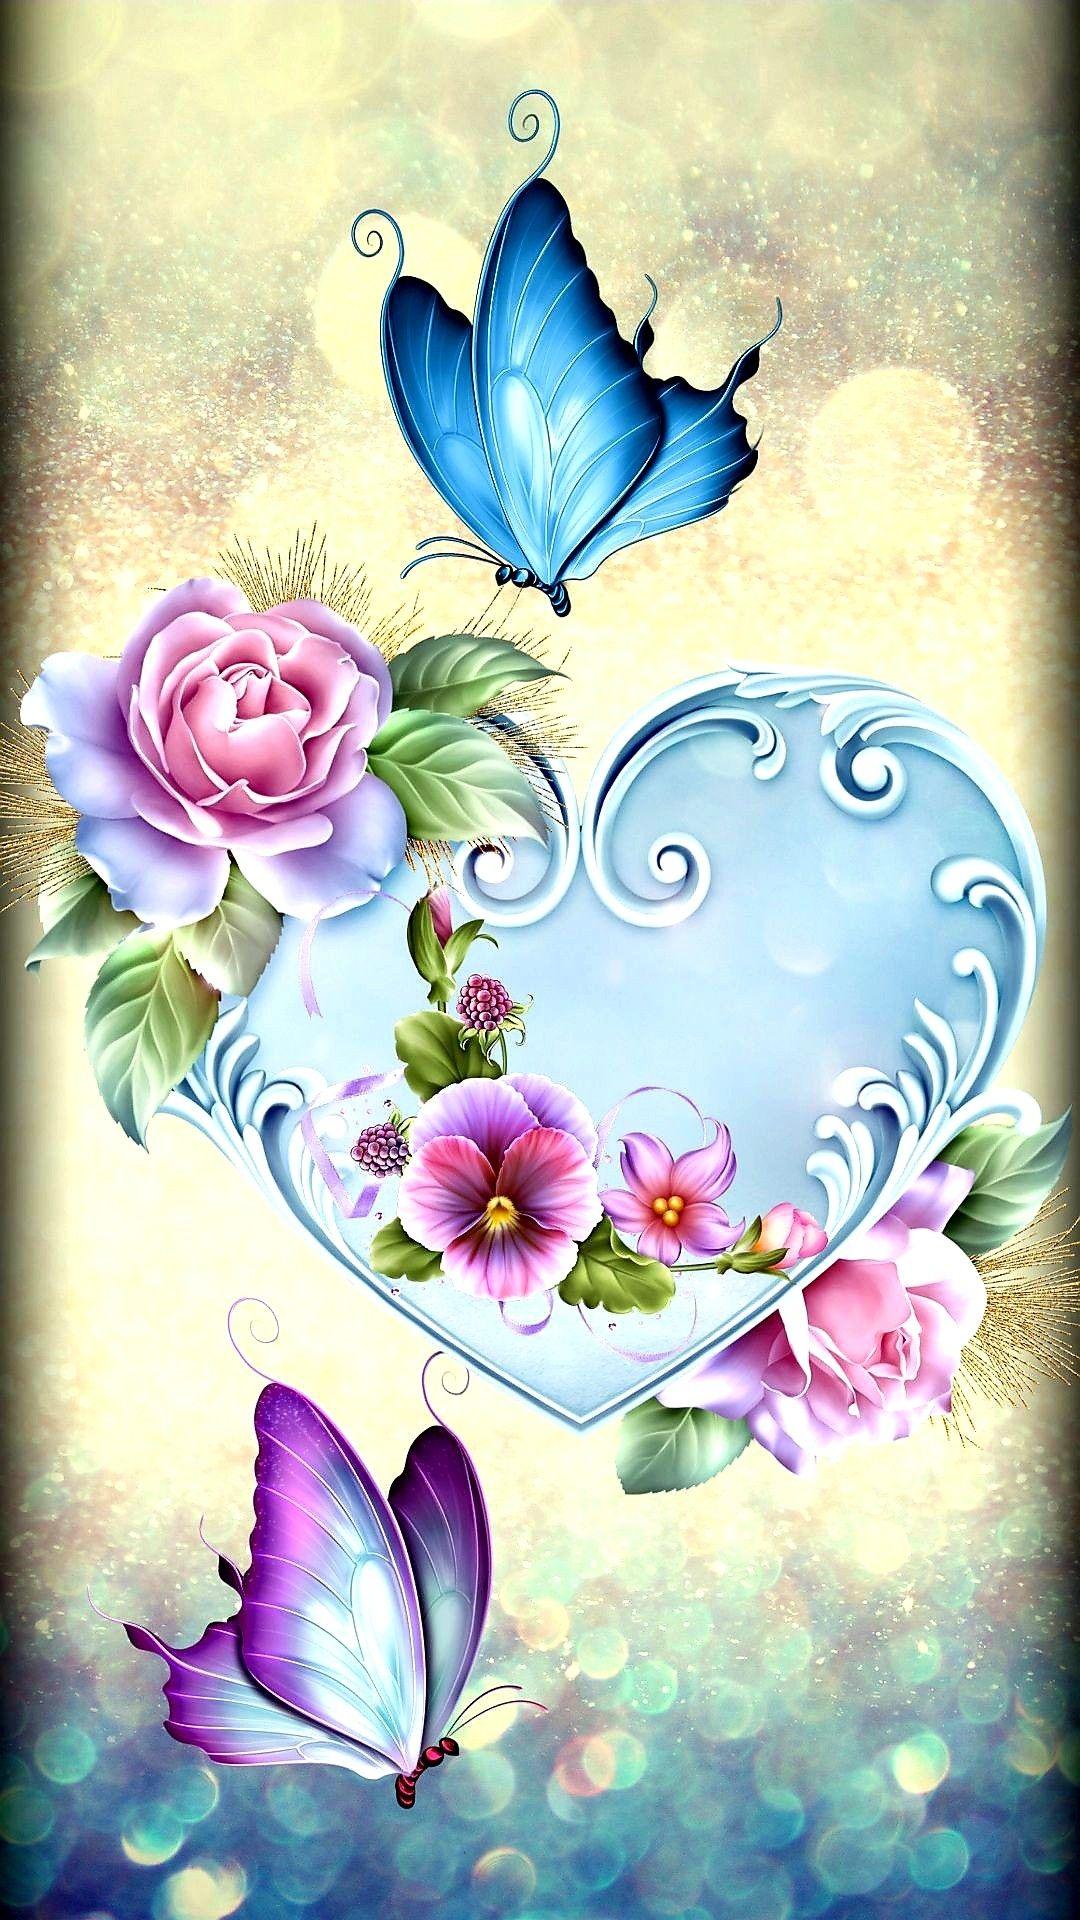 Pin by Jouria Warda on ANIMAIS   Butterfly wallpaper ...